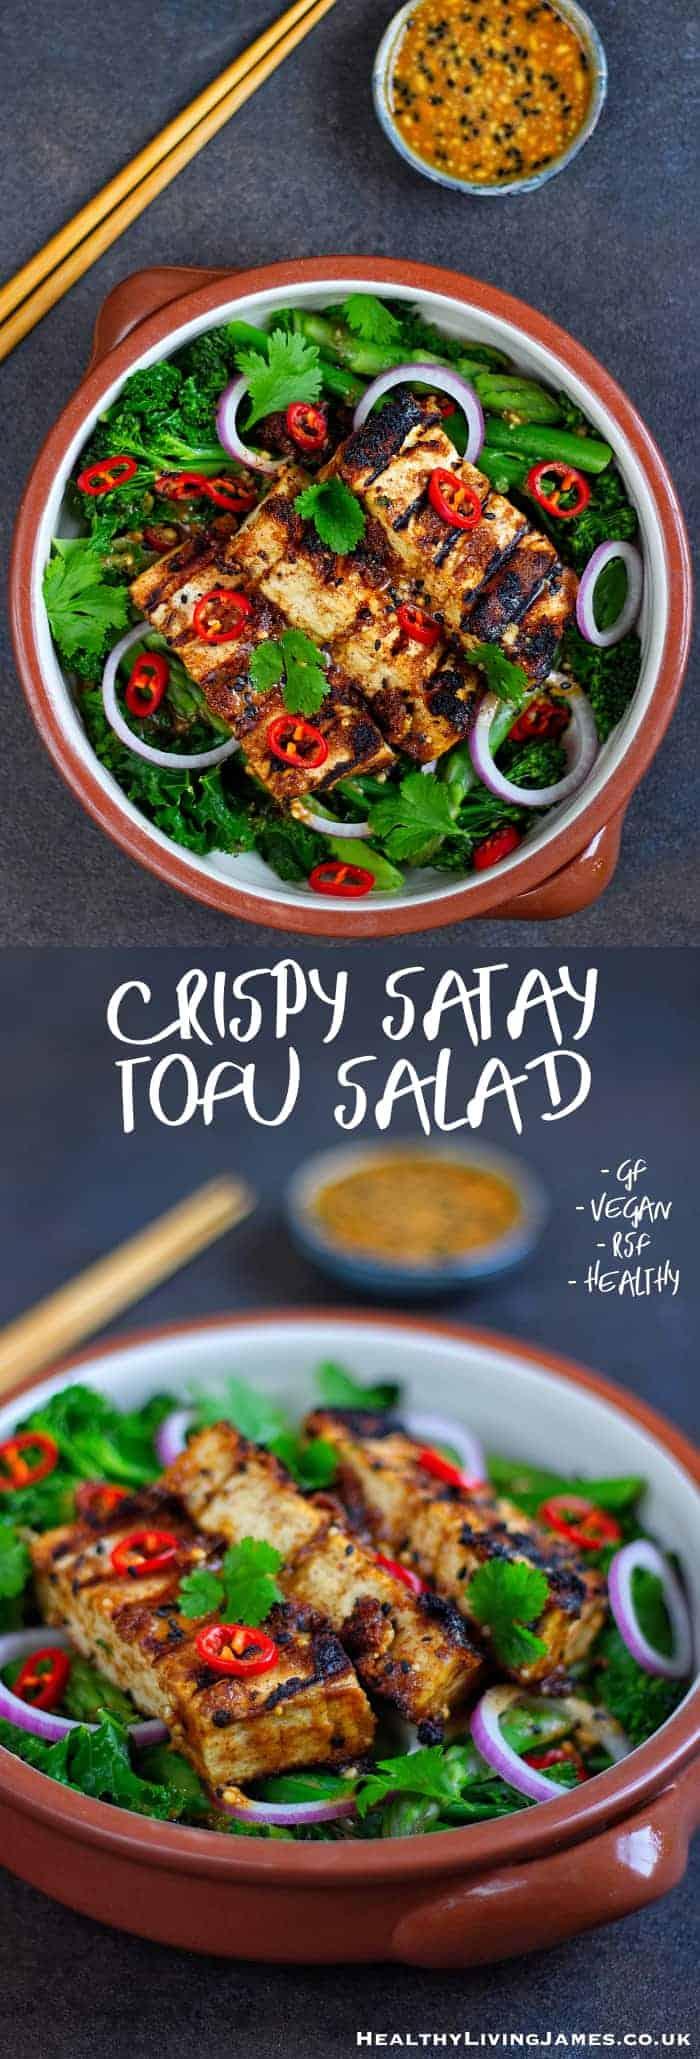 Crispy Satay Tofu Salad